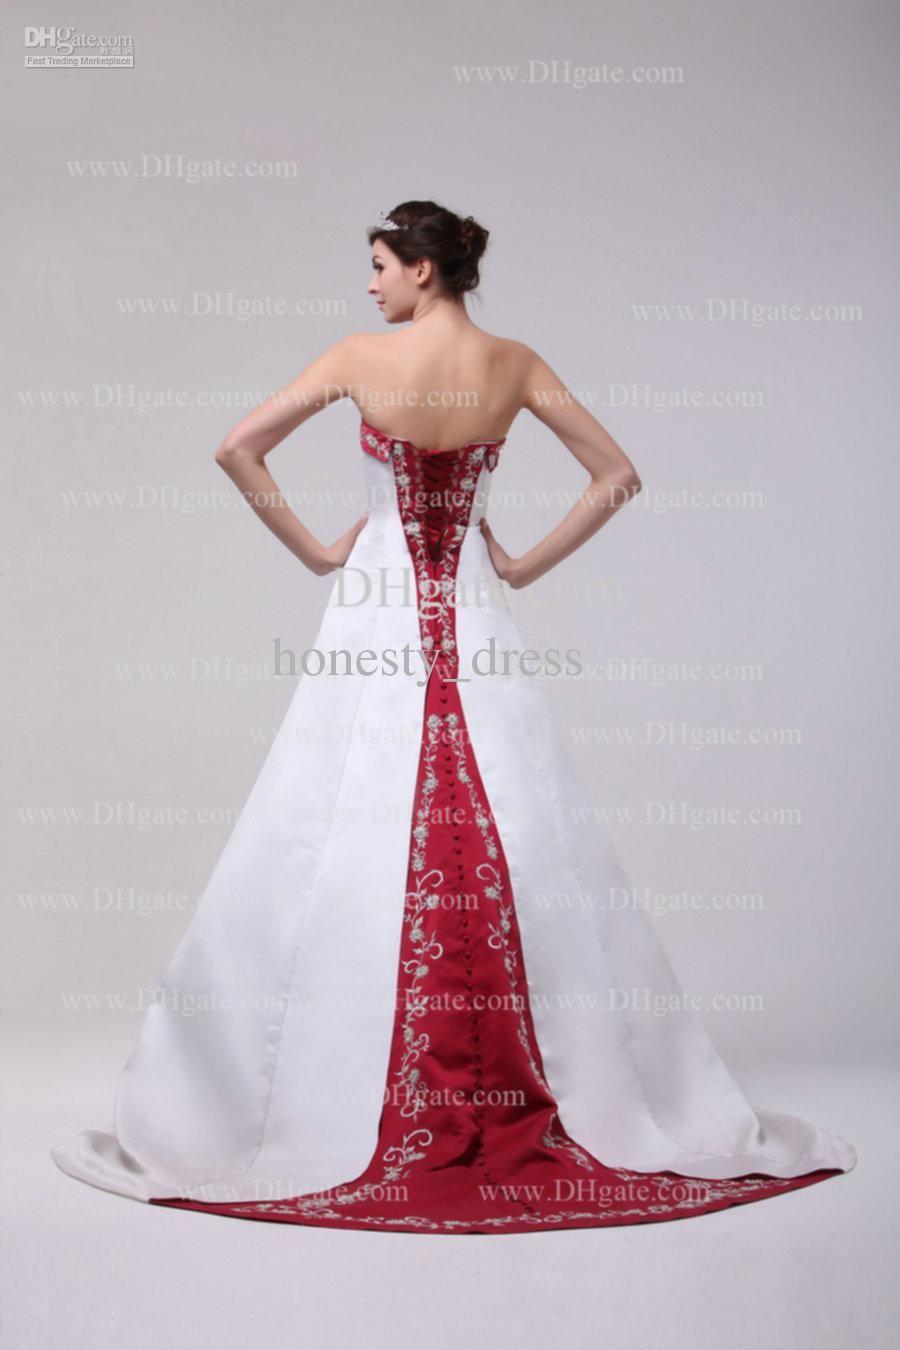 2016 Fashion Dark Red White Embroidery Wedding Dress A Line Strapless Court Train Beads Ruffle Satin Bridal Gowns Vestido De Novia